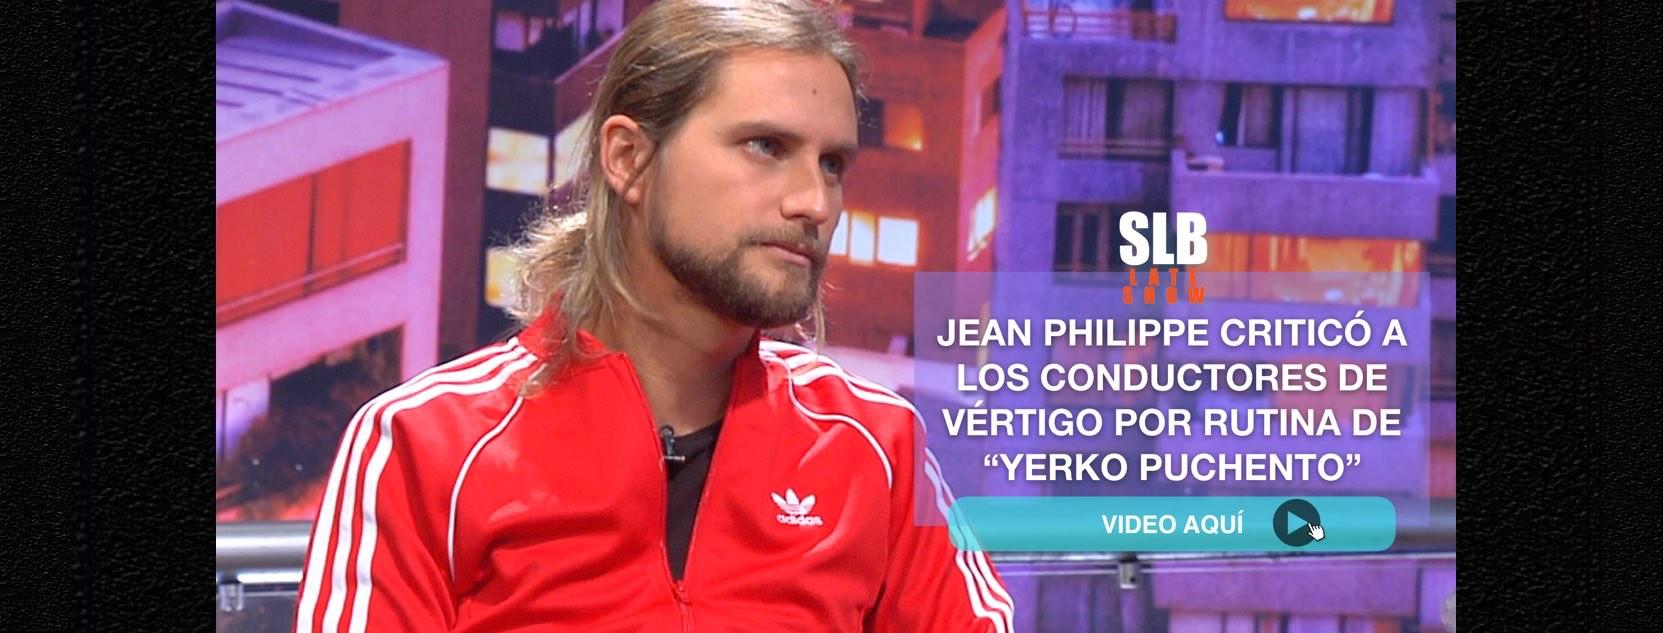 jean-philippe2